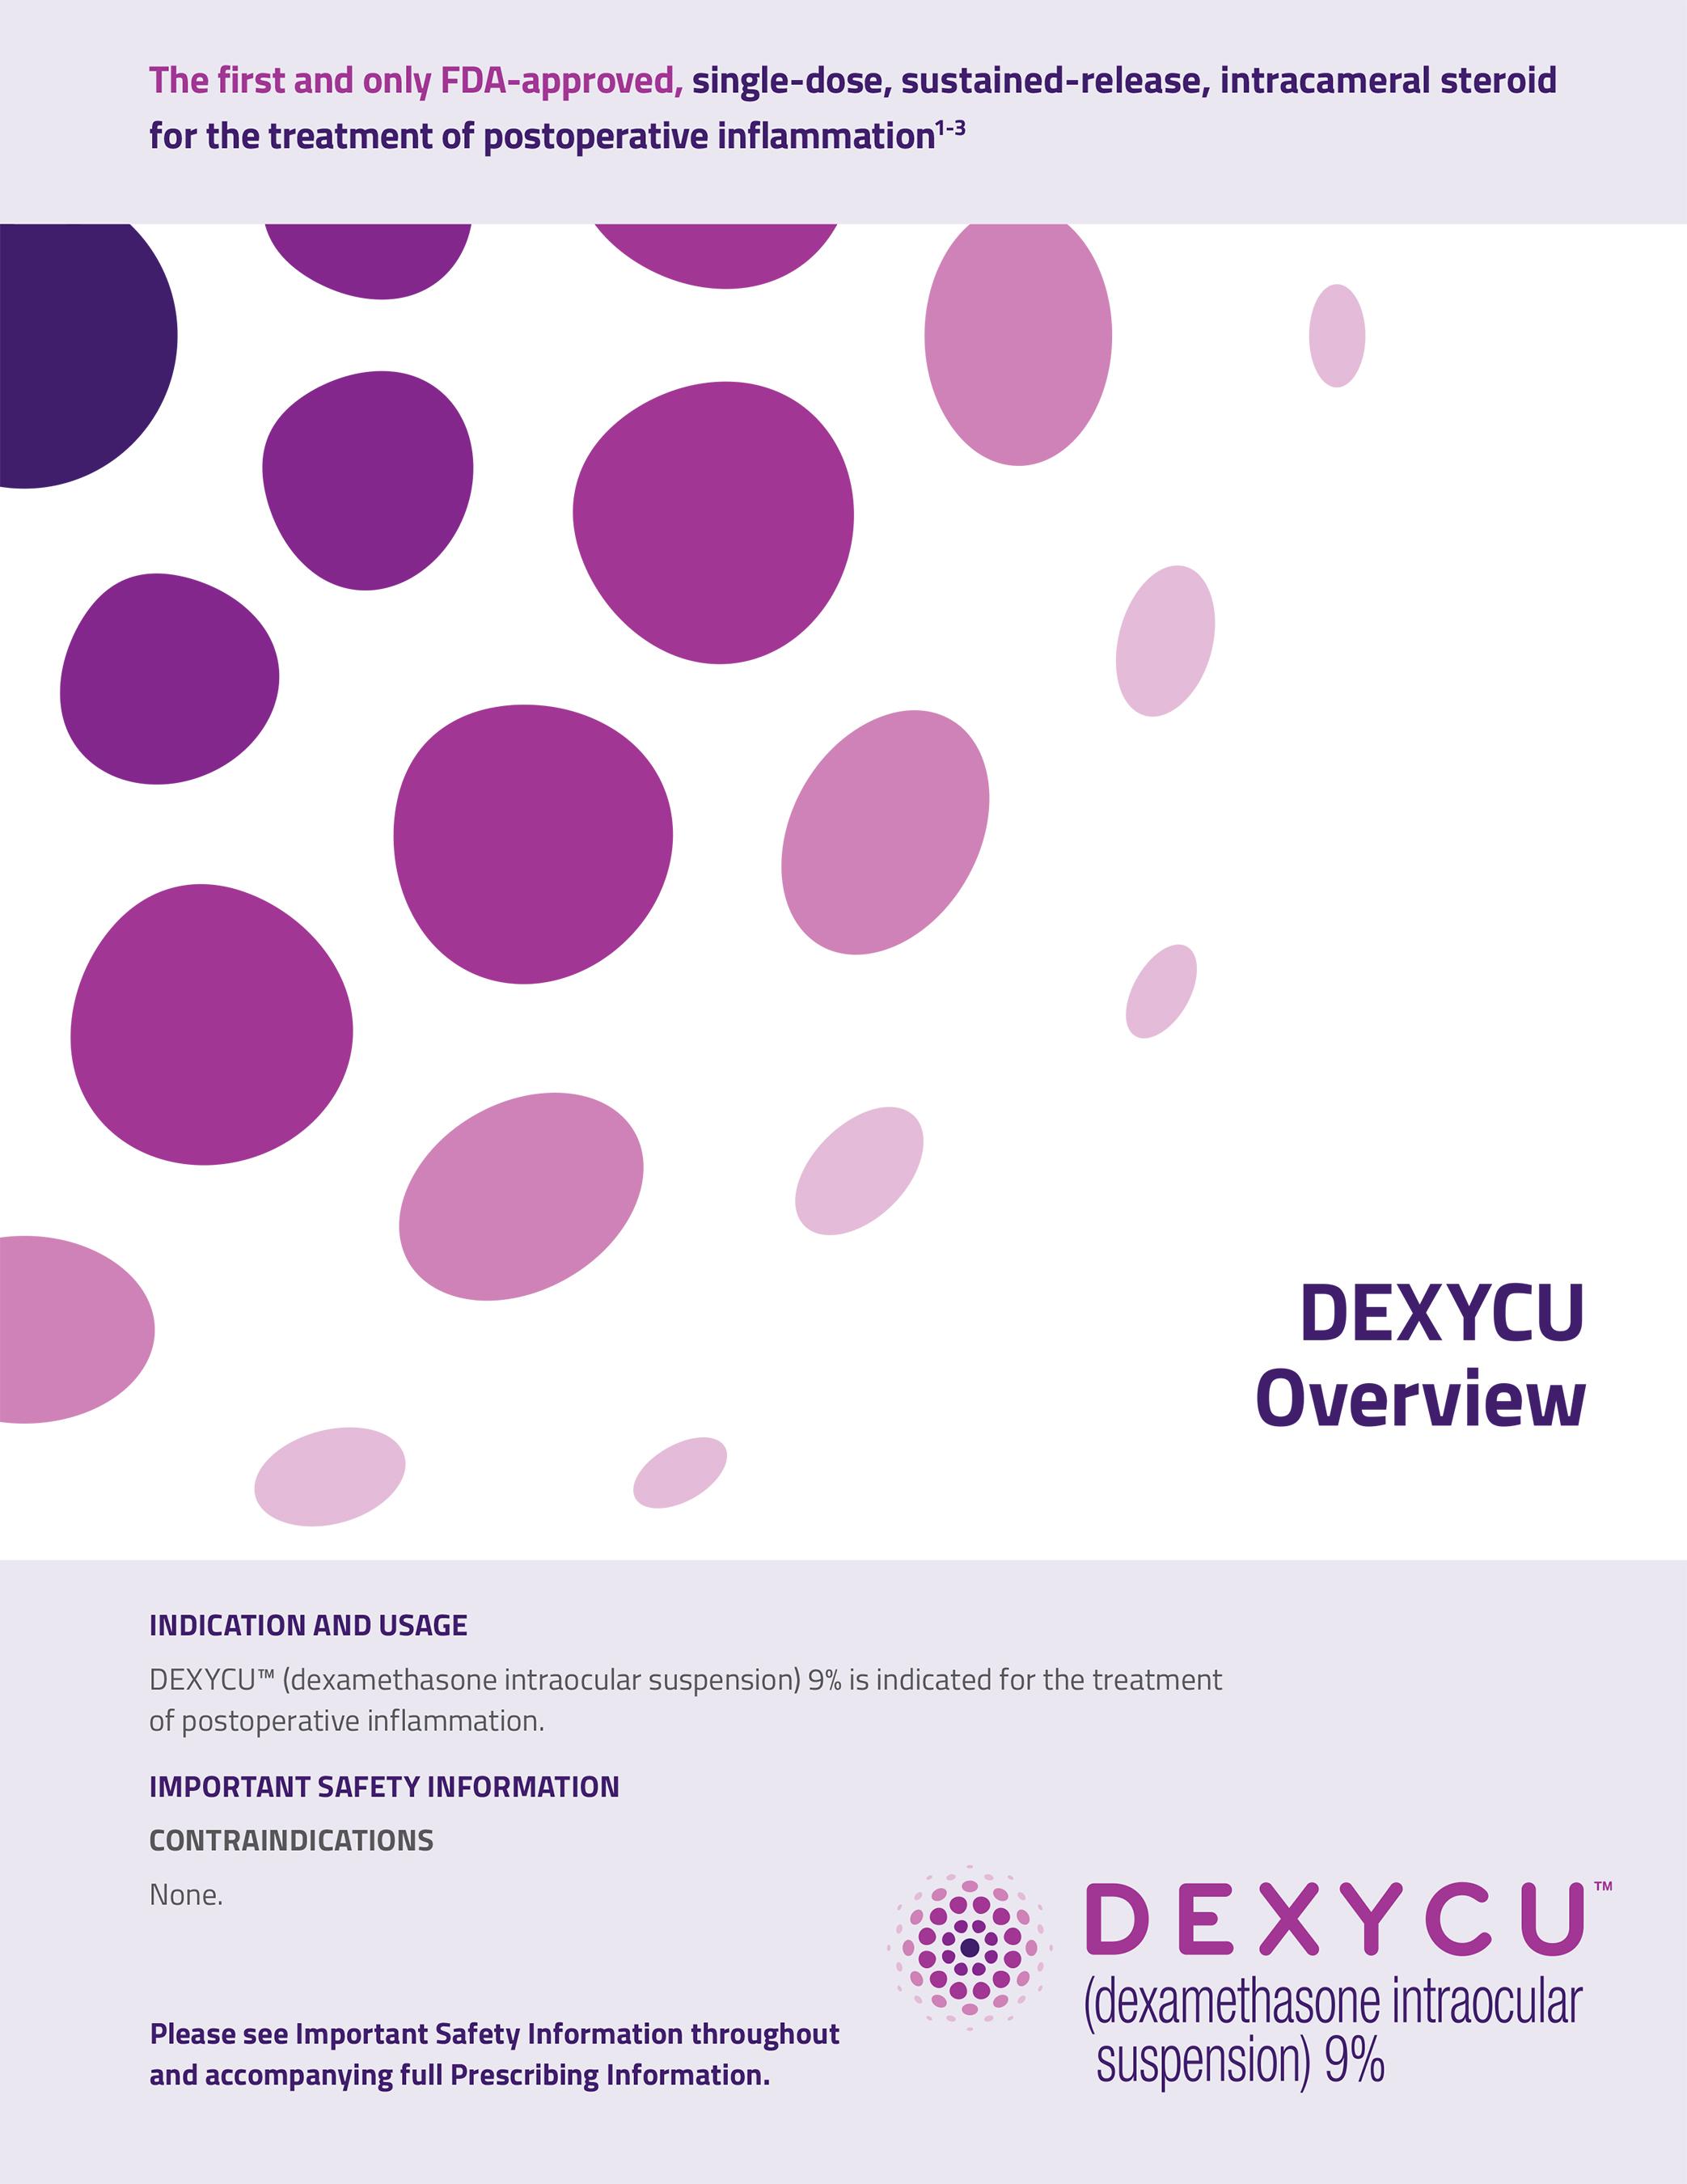 DEXYCU Overview